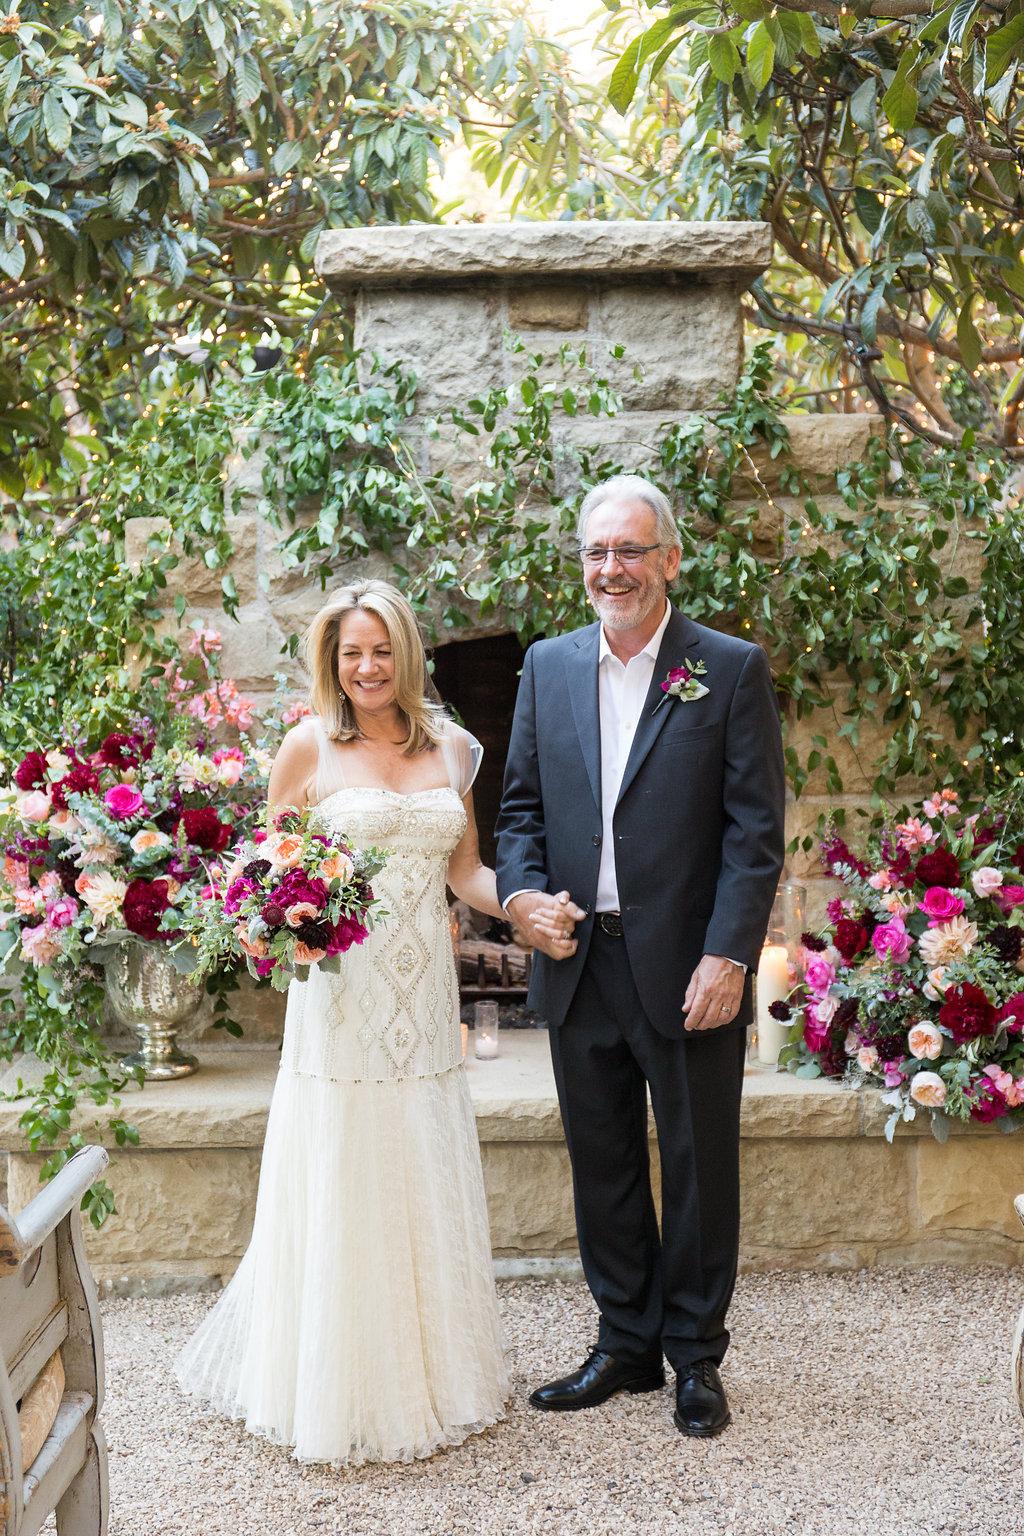 SantaBarbaraWeddingStyle.com | Barbra Mosouris | Cody Floral | San Ysidro Ranch | Elopement | Melissa Musgrove | Wedding Ceremony Floral